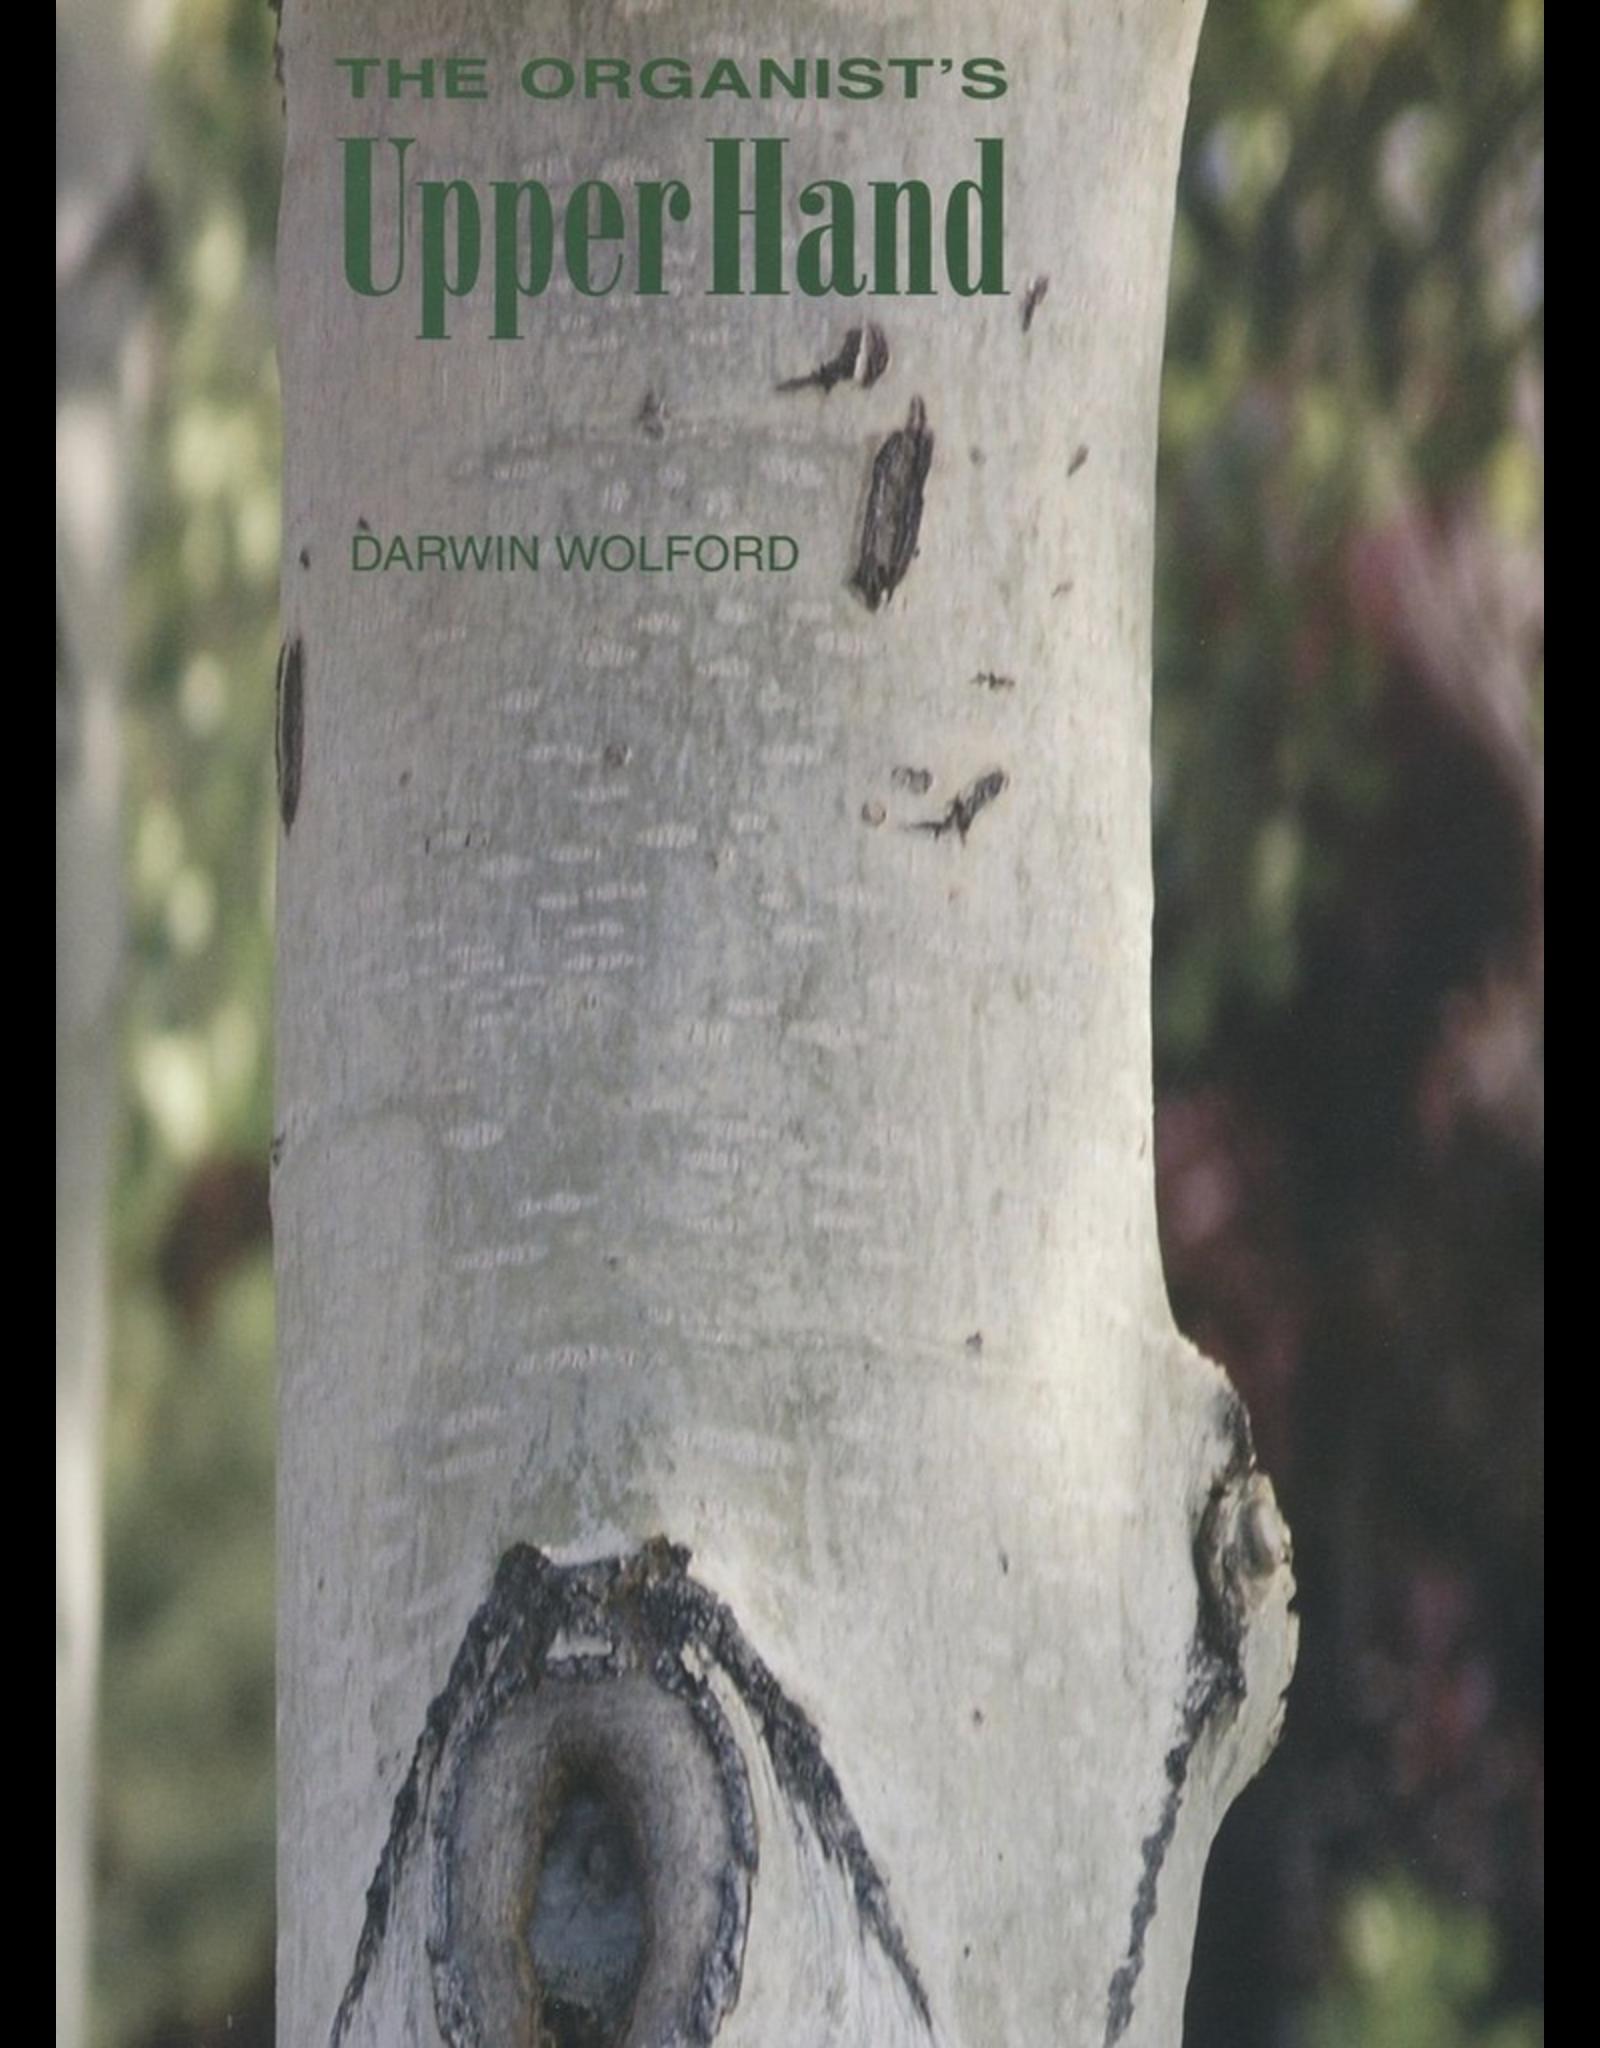 Jackman Music Organist's Upper Hand Book 1 by Darwin Wolford